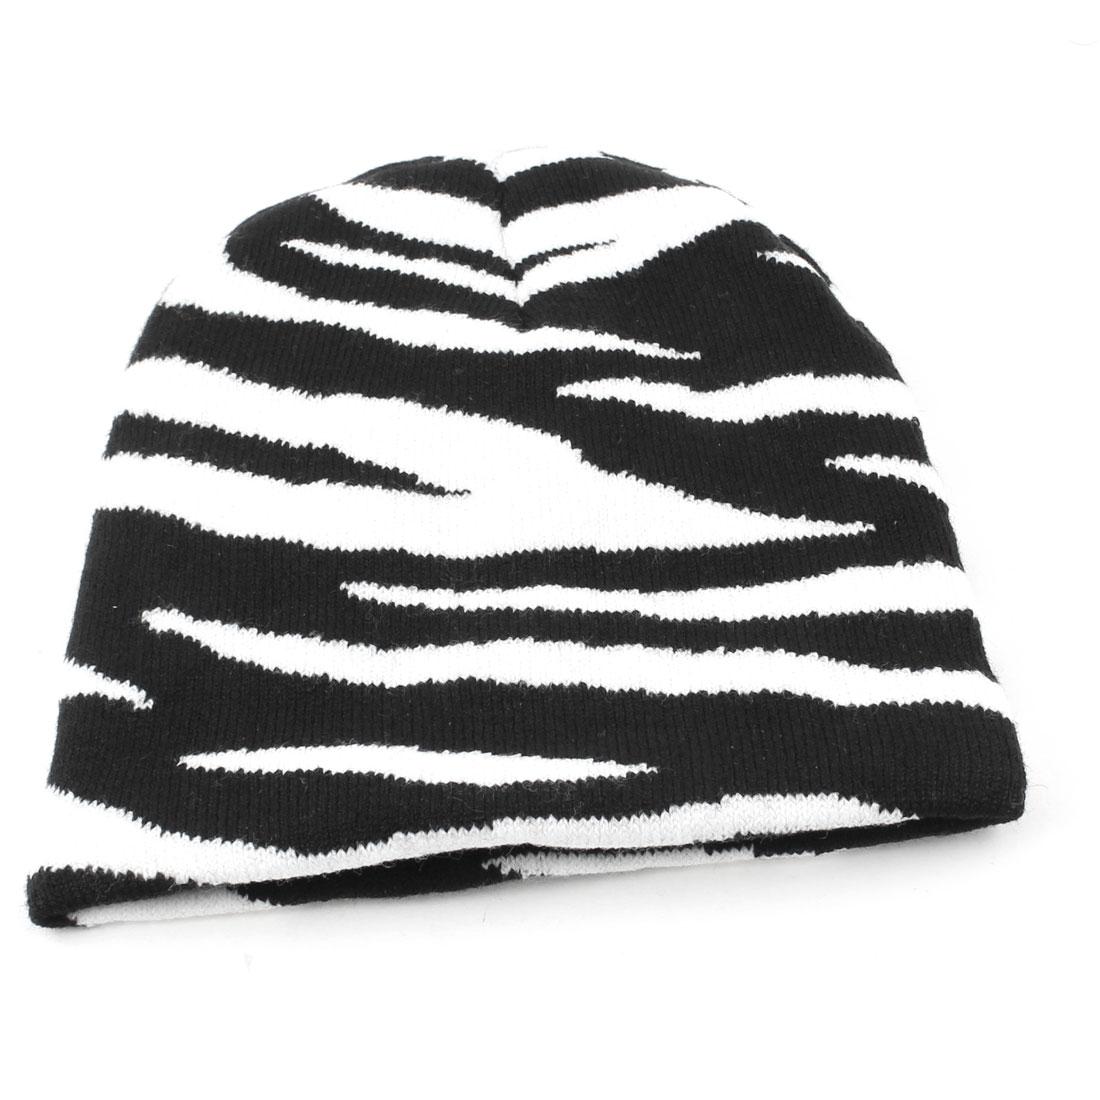 Zebra Print Black White Stretchy Knitting Beanie Hat Cap for Men Lady